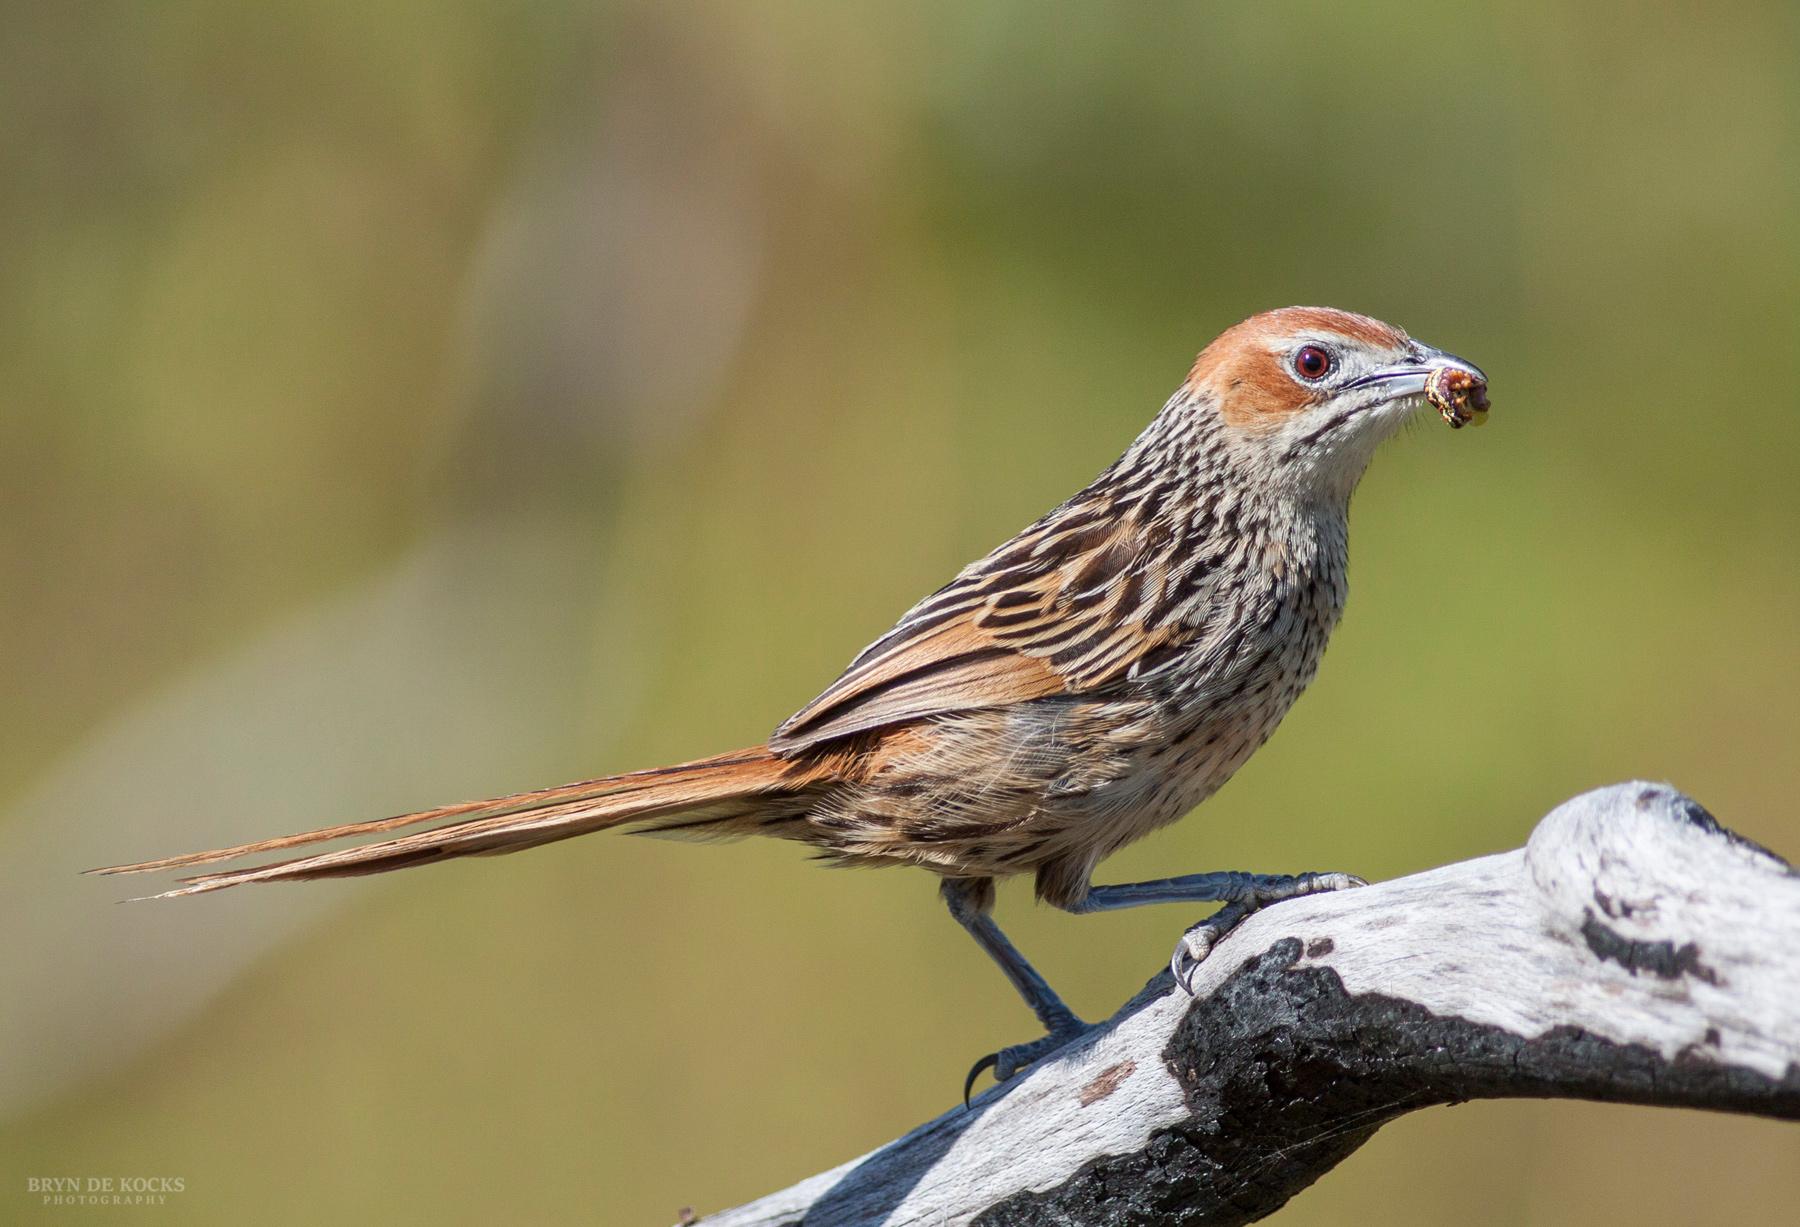 Cape Grassbird with Worm